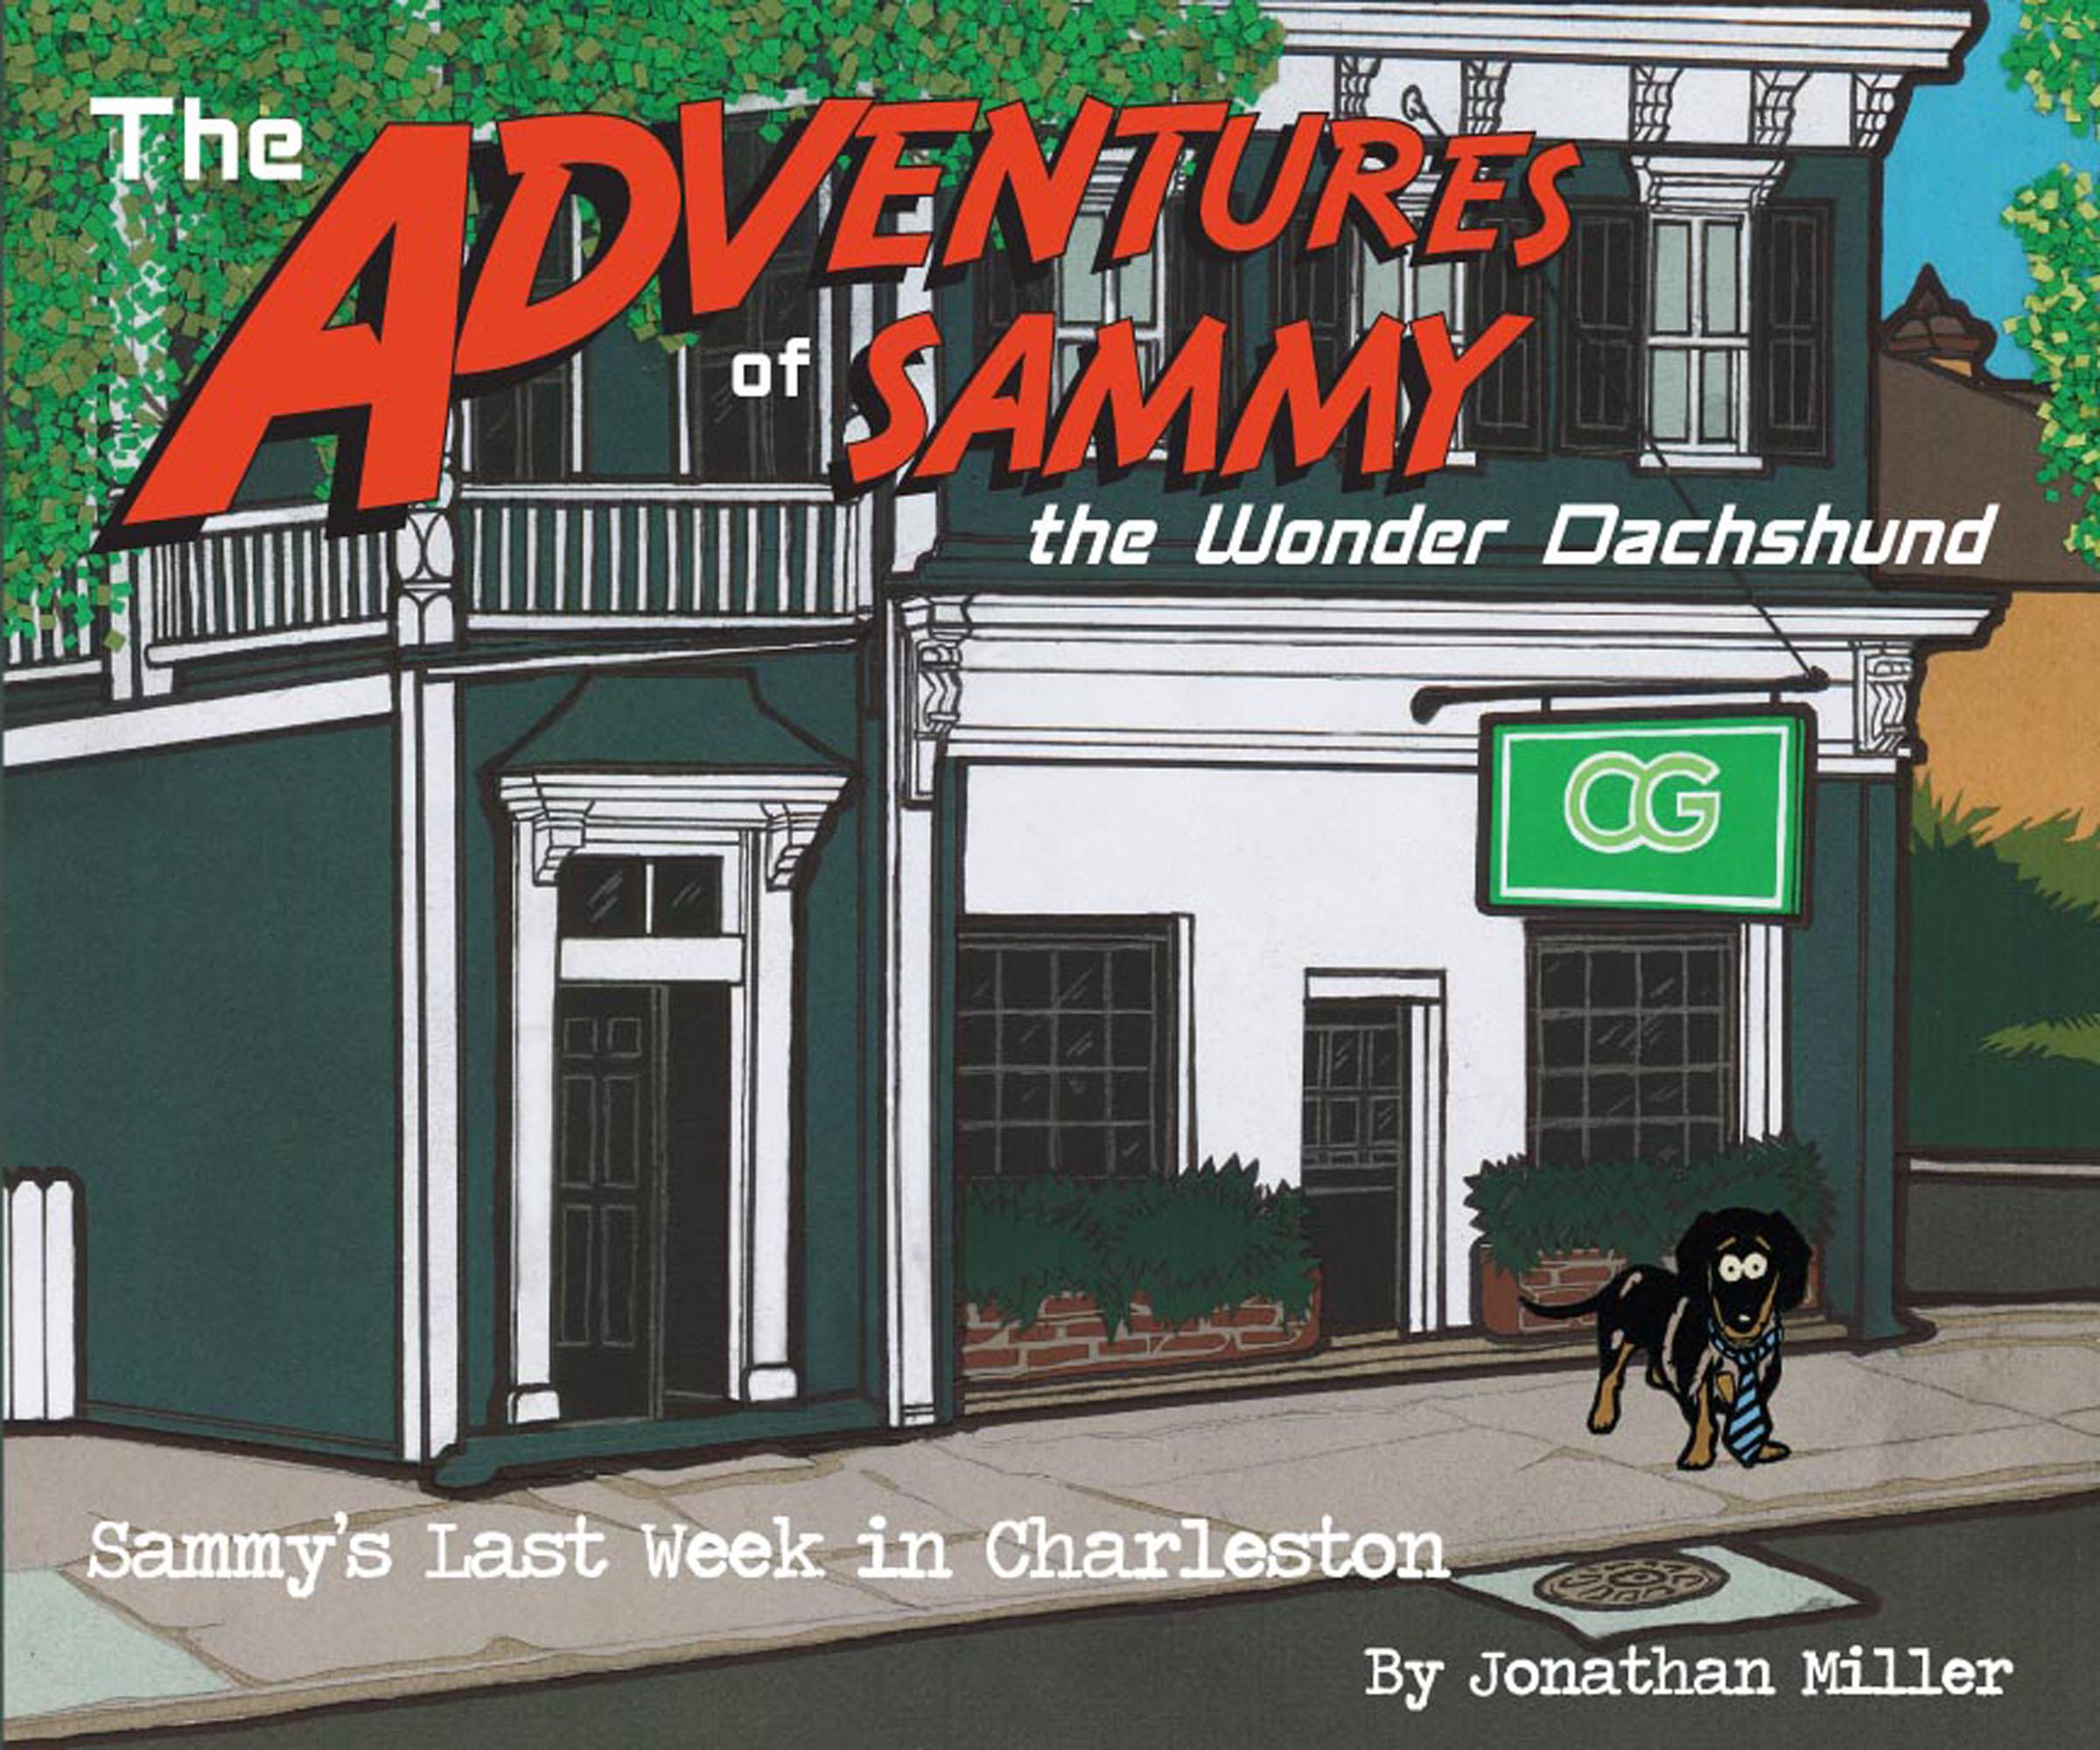 Sammy the Wonder Dachshund